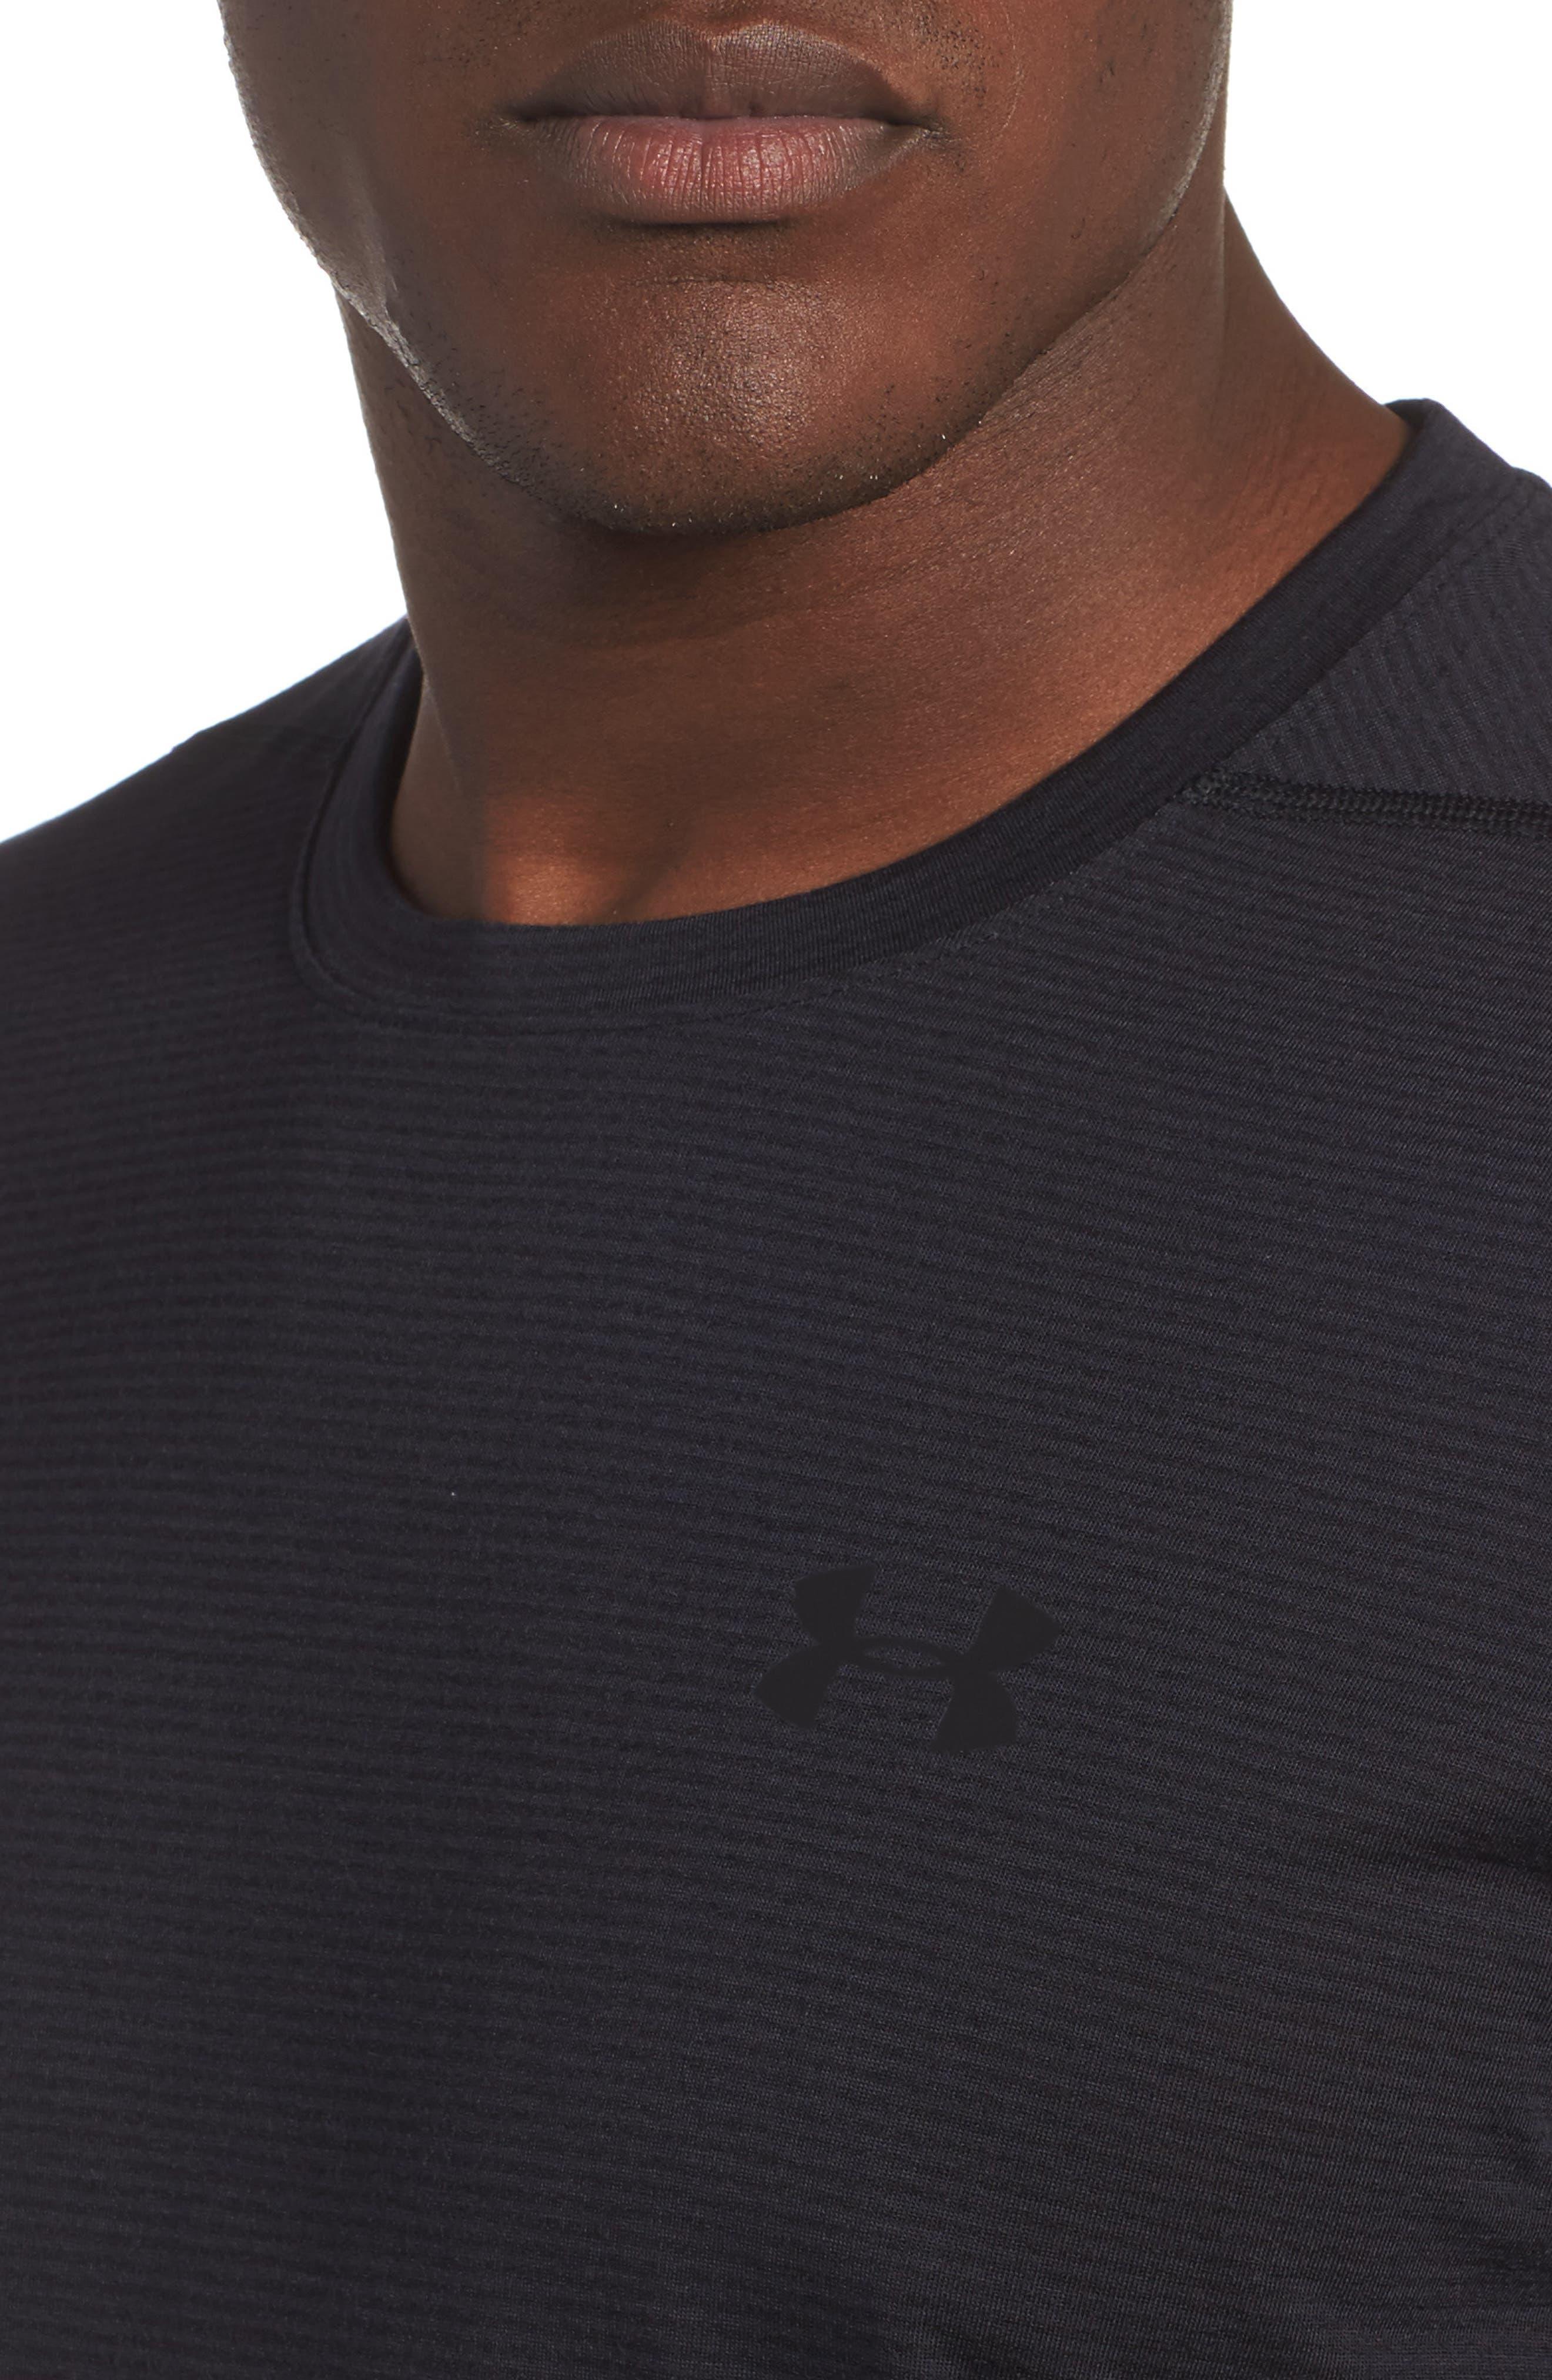 Threadborne Siro Regular Fit T-Shirt,                             Alternate thumbnail 4, color,                             001